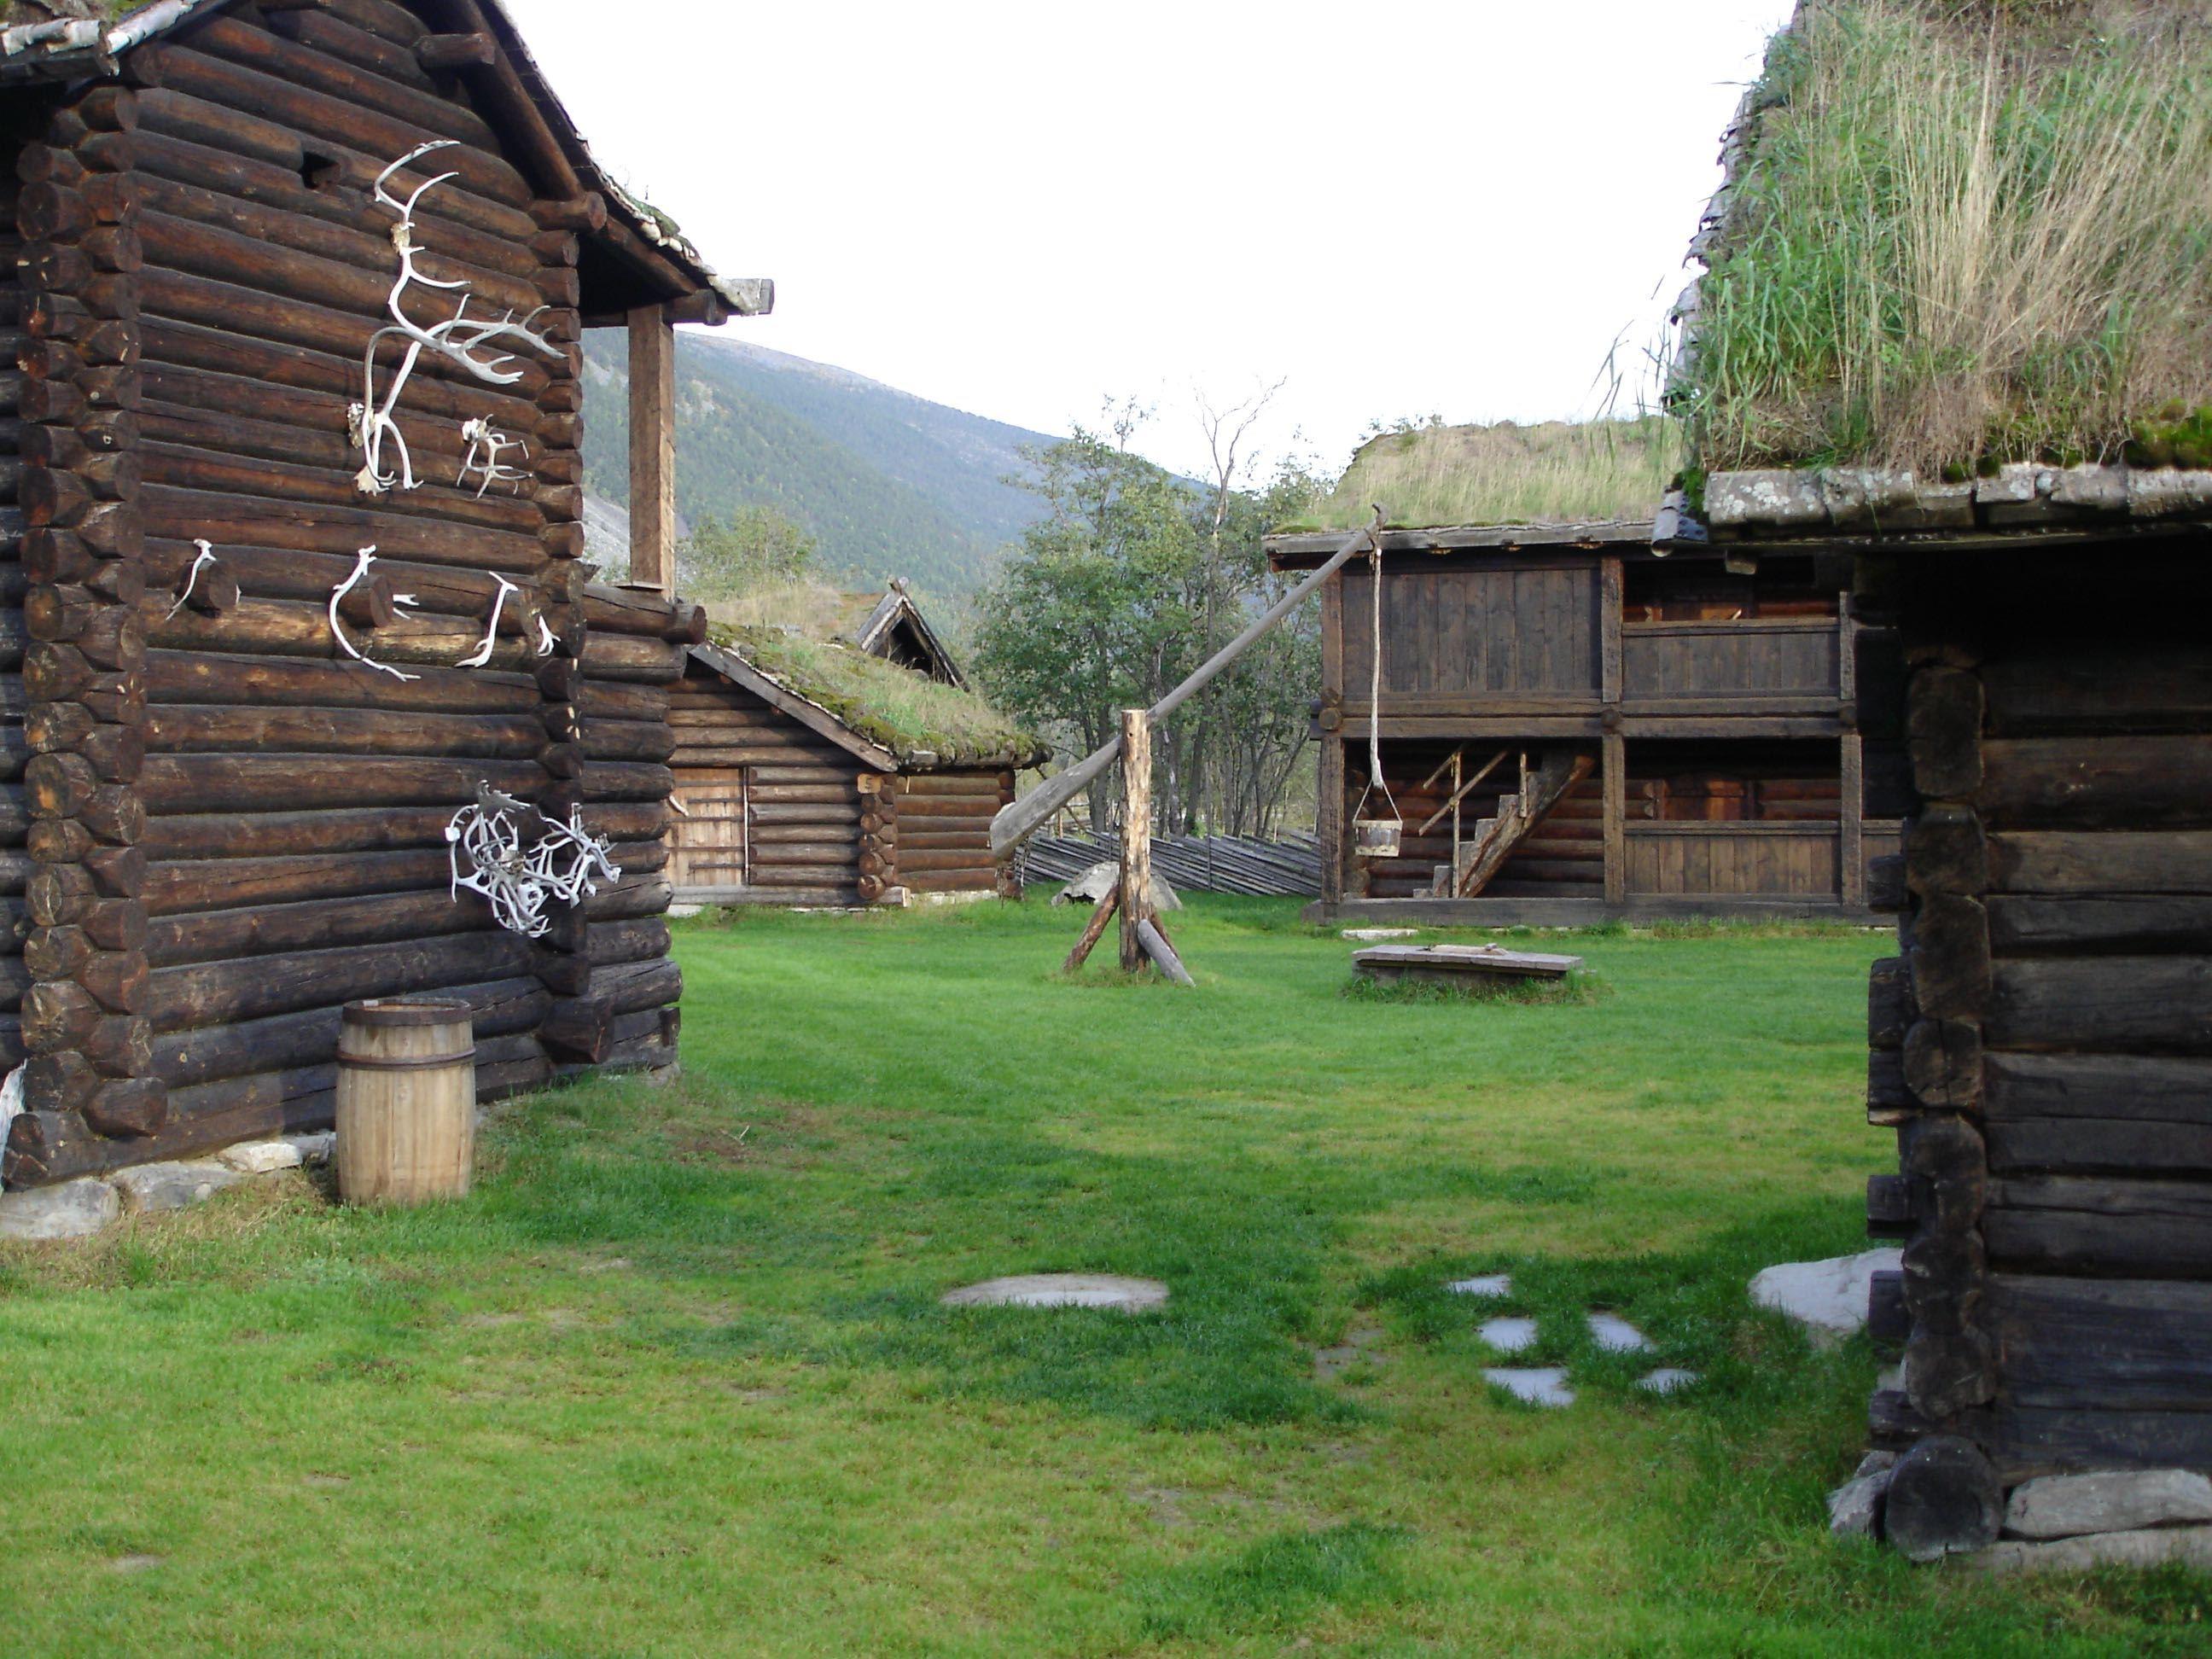 Jørundgard Medieval Centre